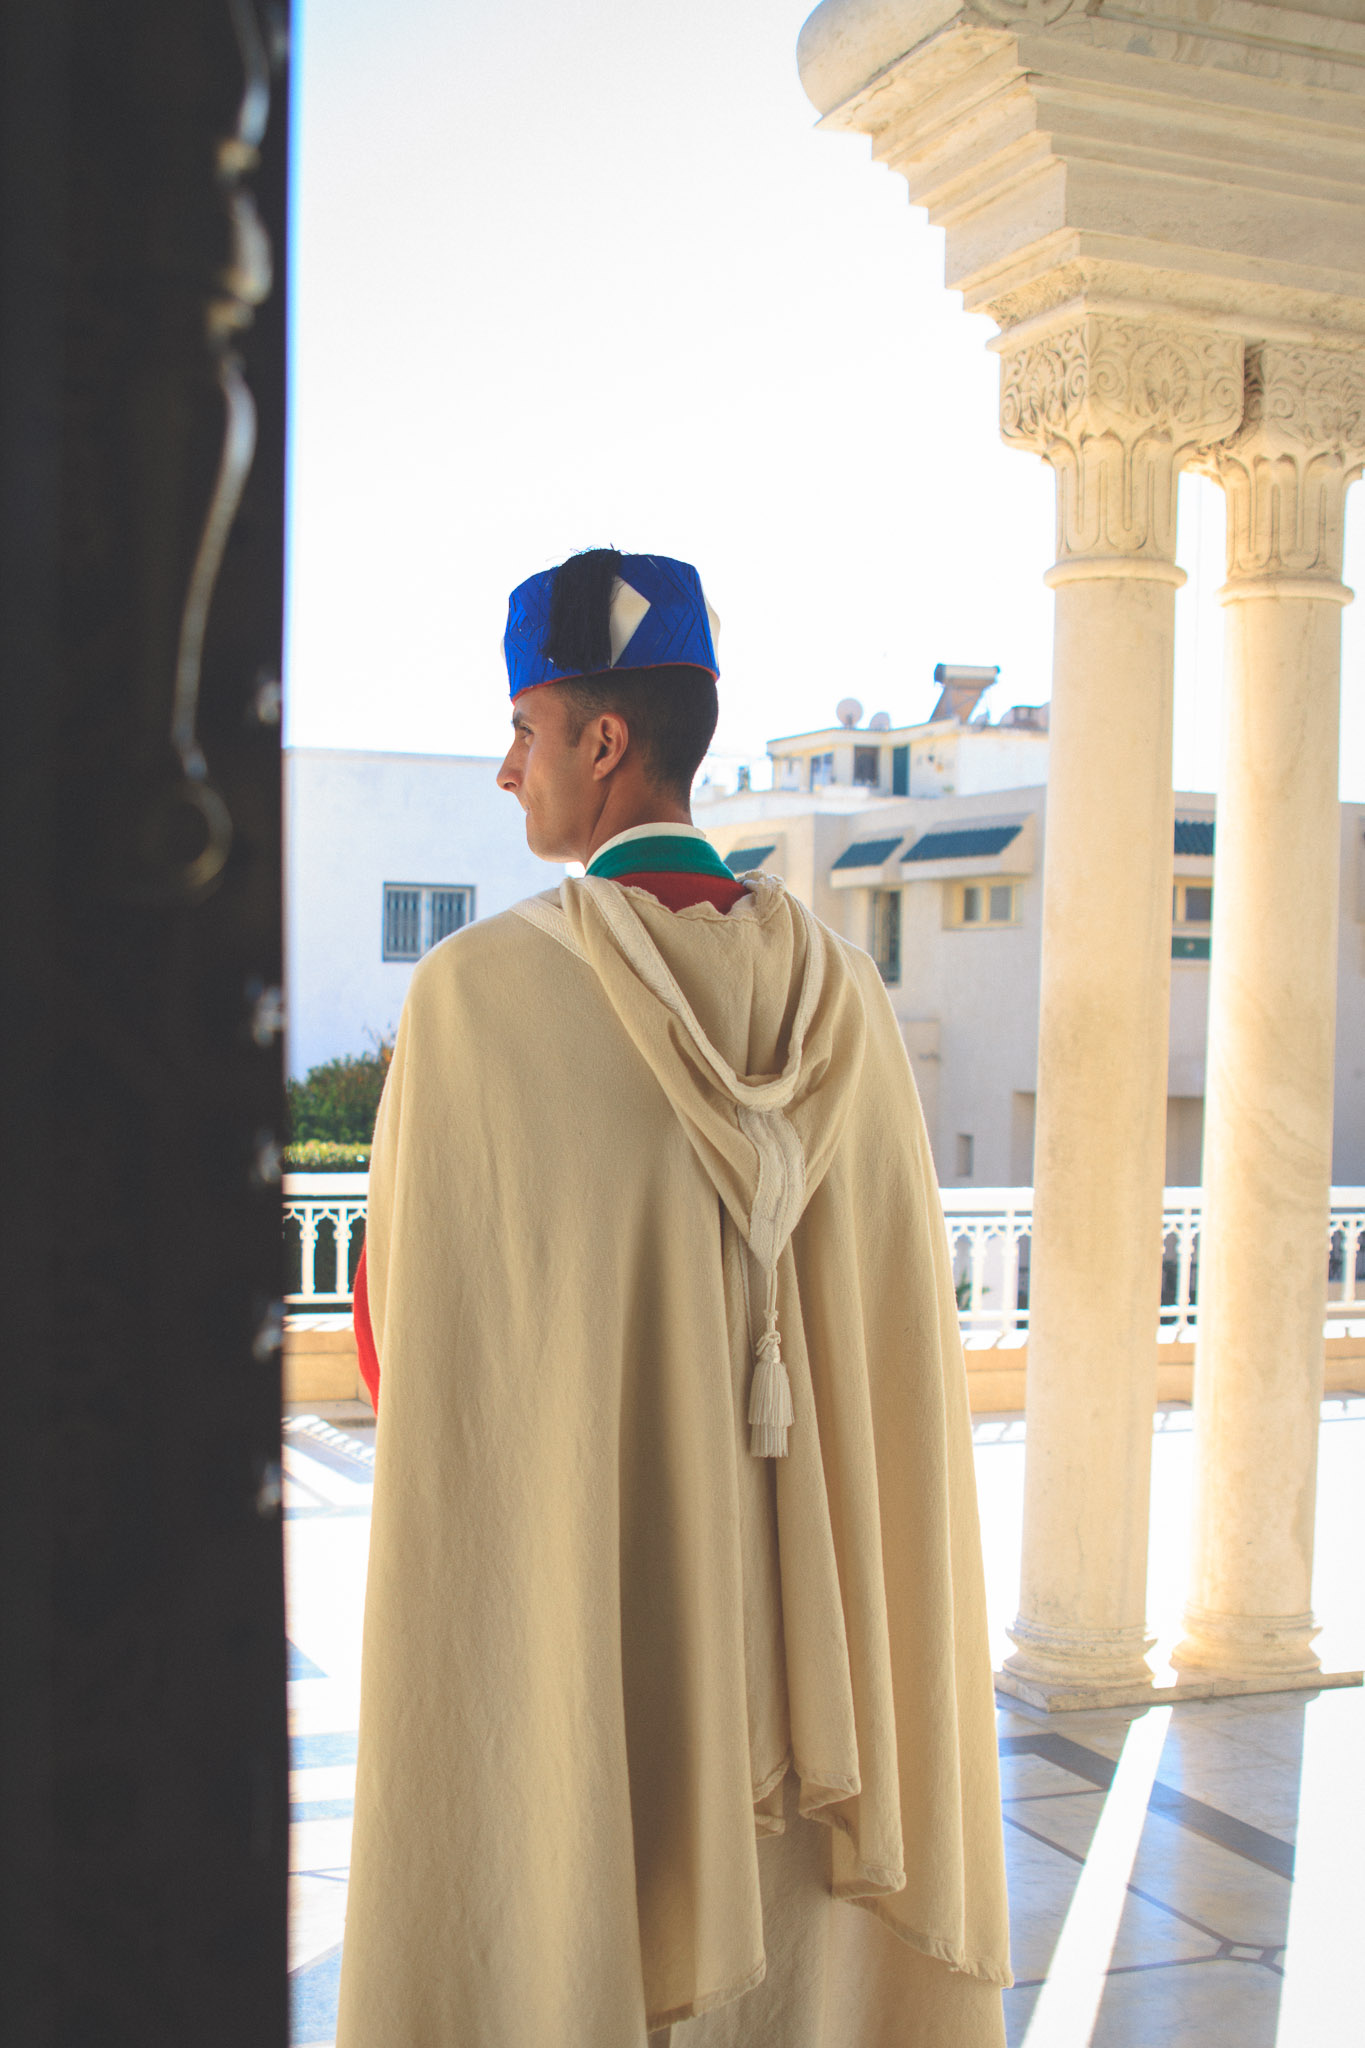 morocco_rabat_fez_casablanca_lesleyade_photography-2.jpg